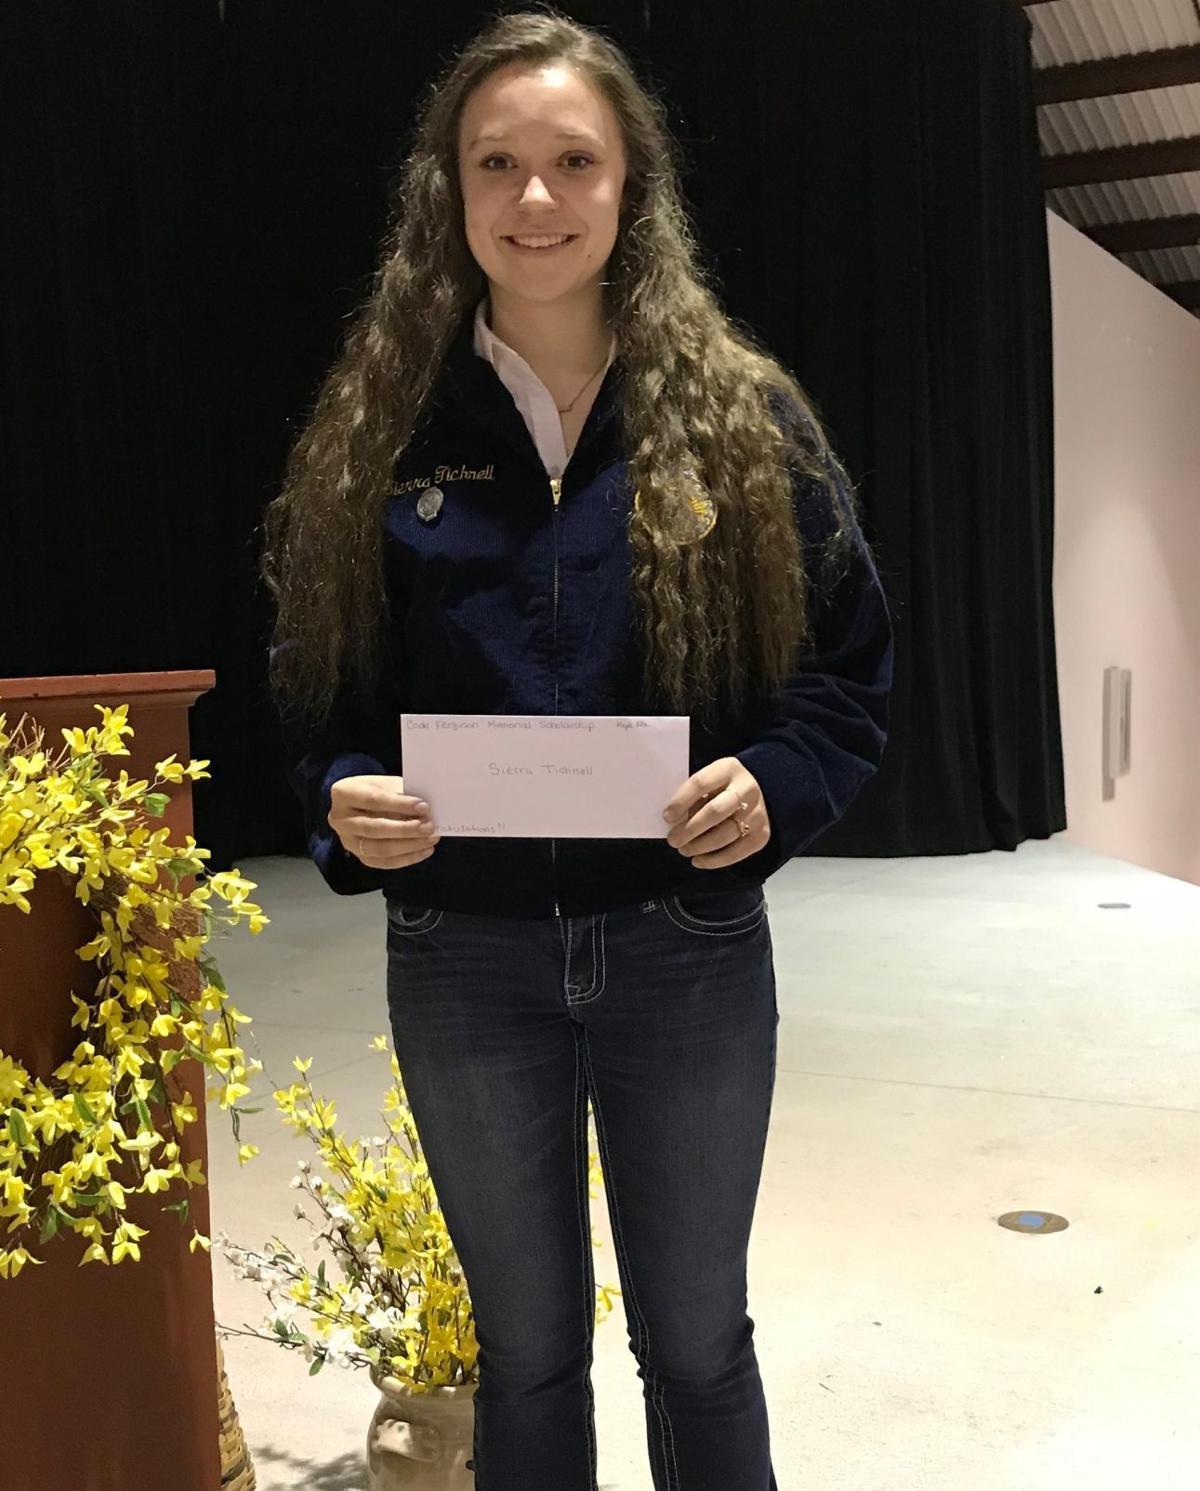 Cody Ferguson Memorial Scholarship